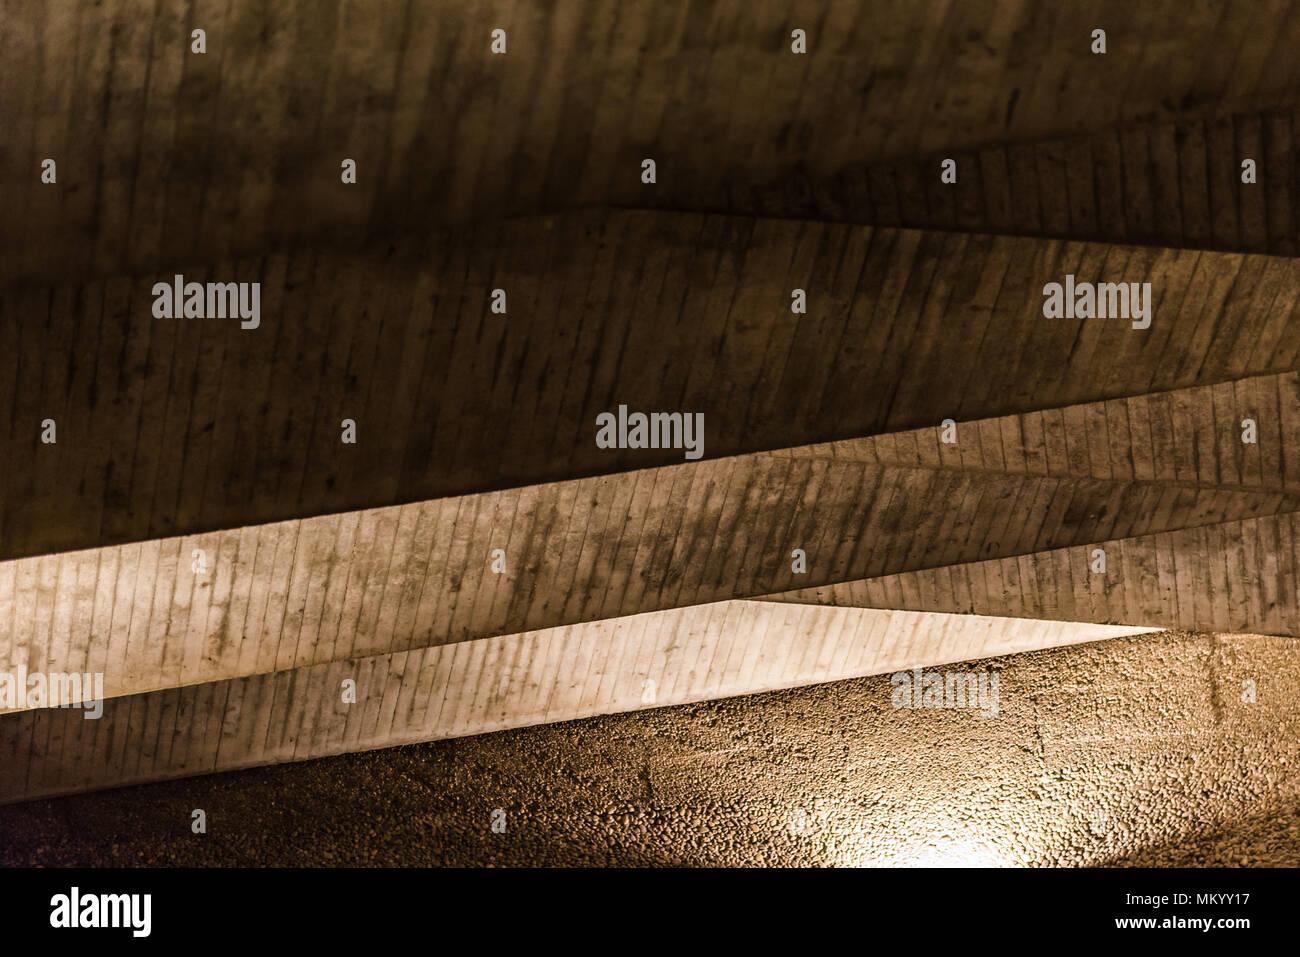 Beleuchtete Betondecke. Alte texturiert. Stockbild